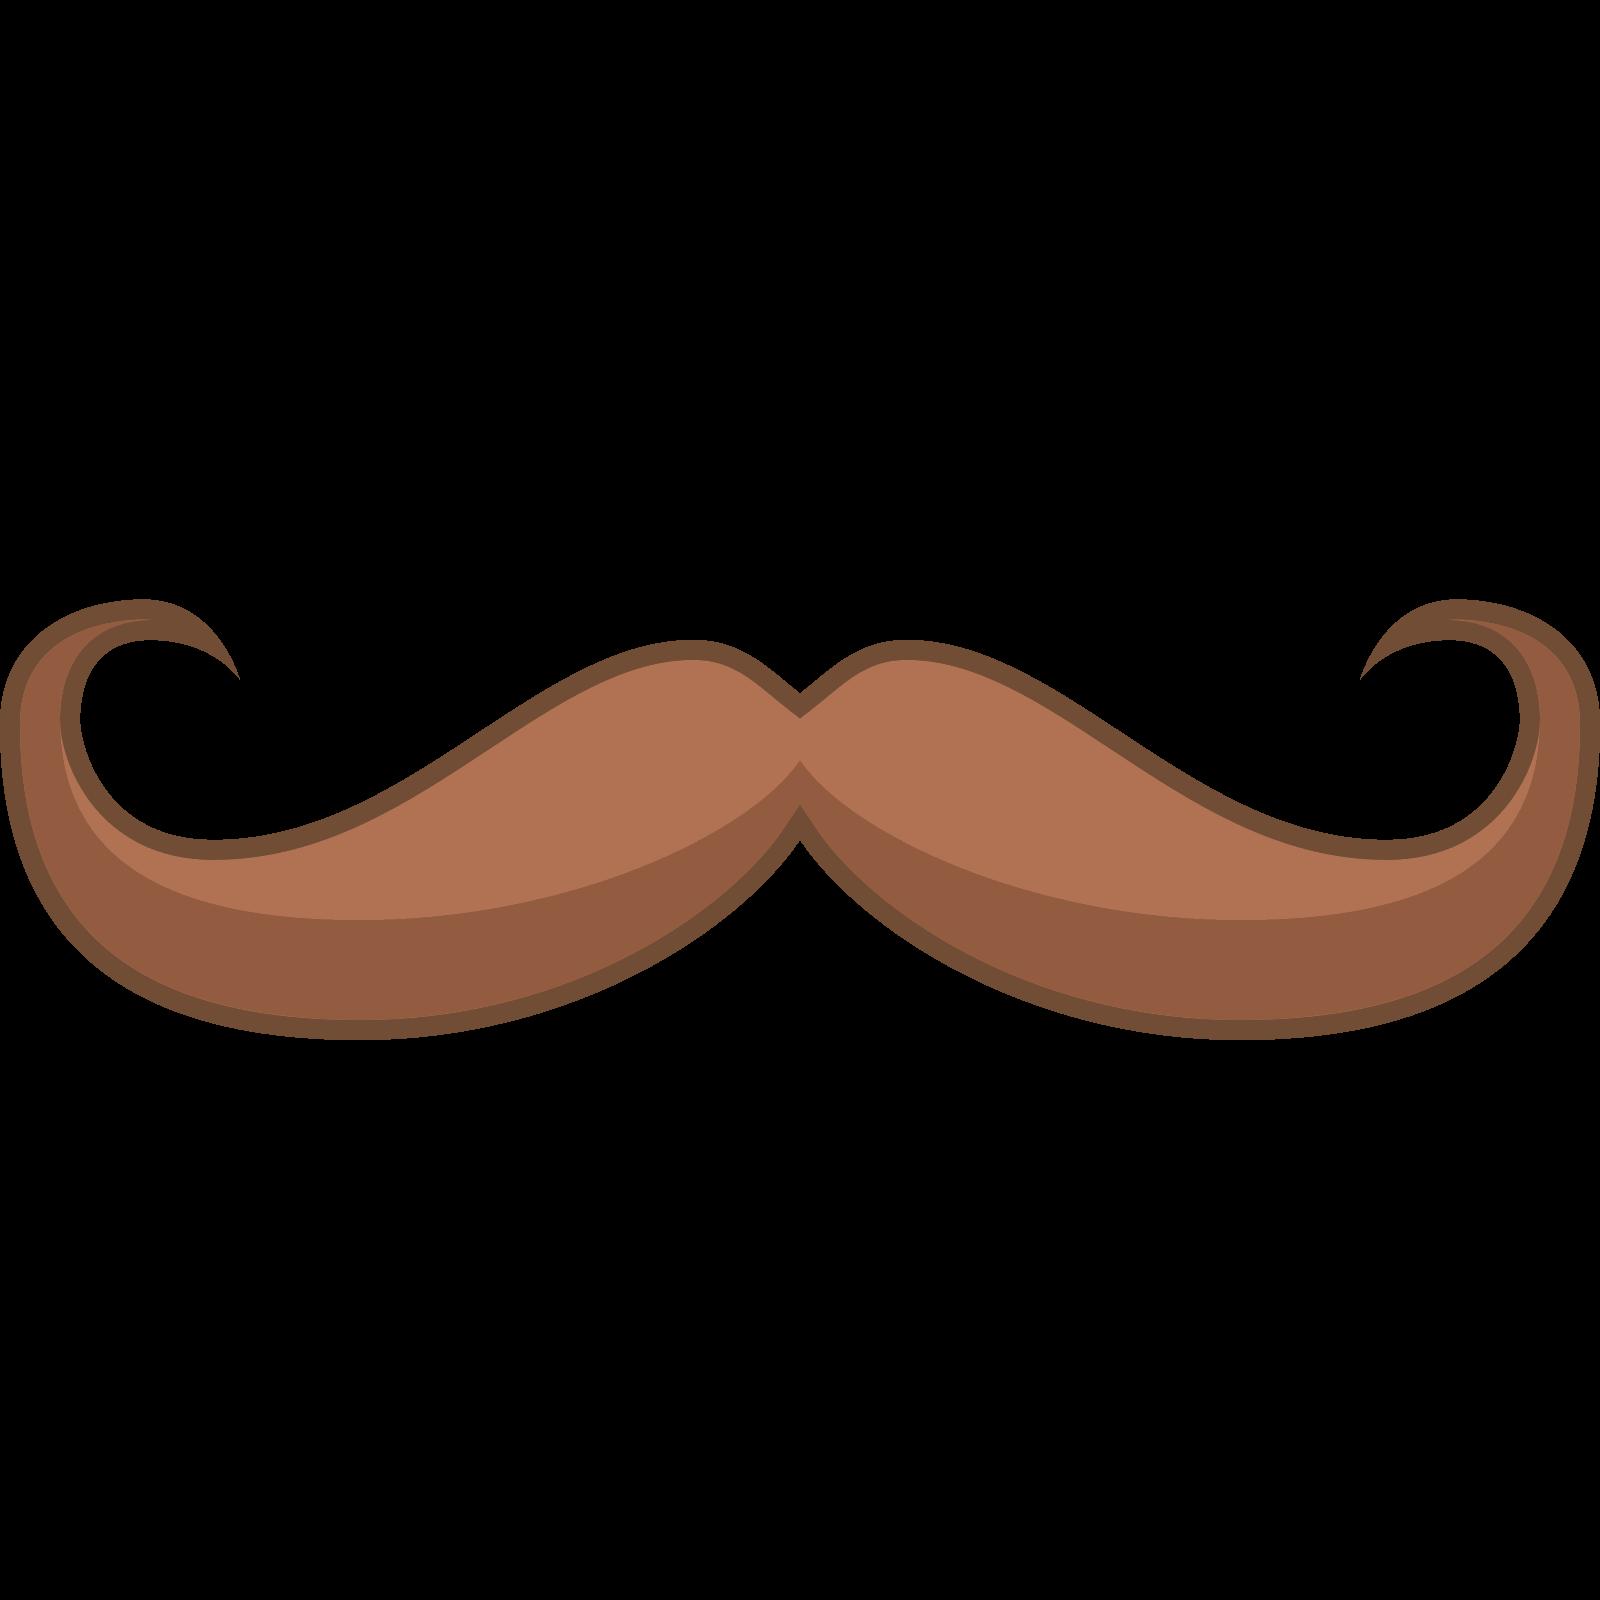 Arrow mustache heart clipart picture black and white download Handlebar Mustache Icon - free download, PNG and vector picture black and white download